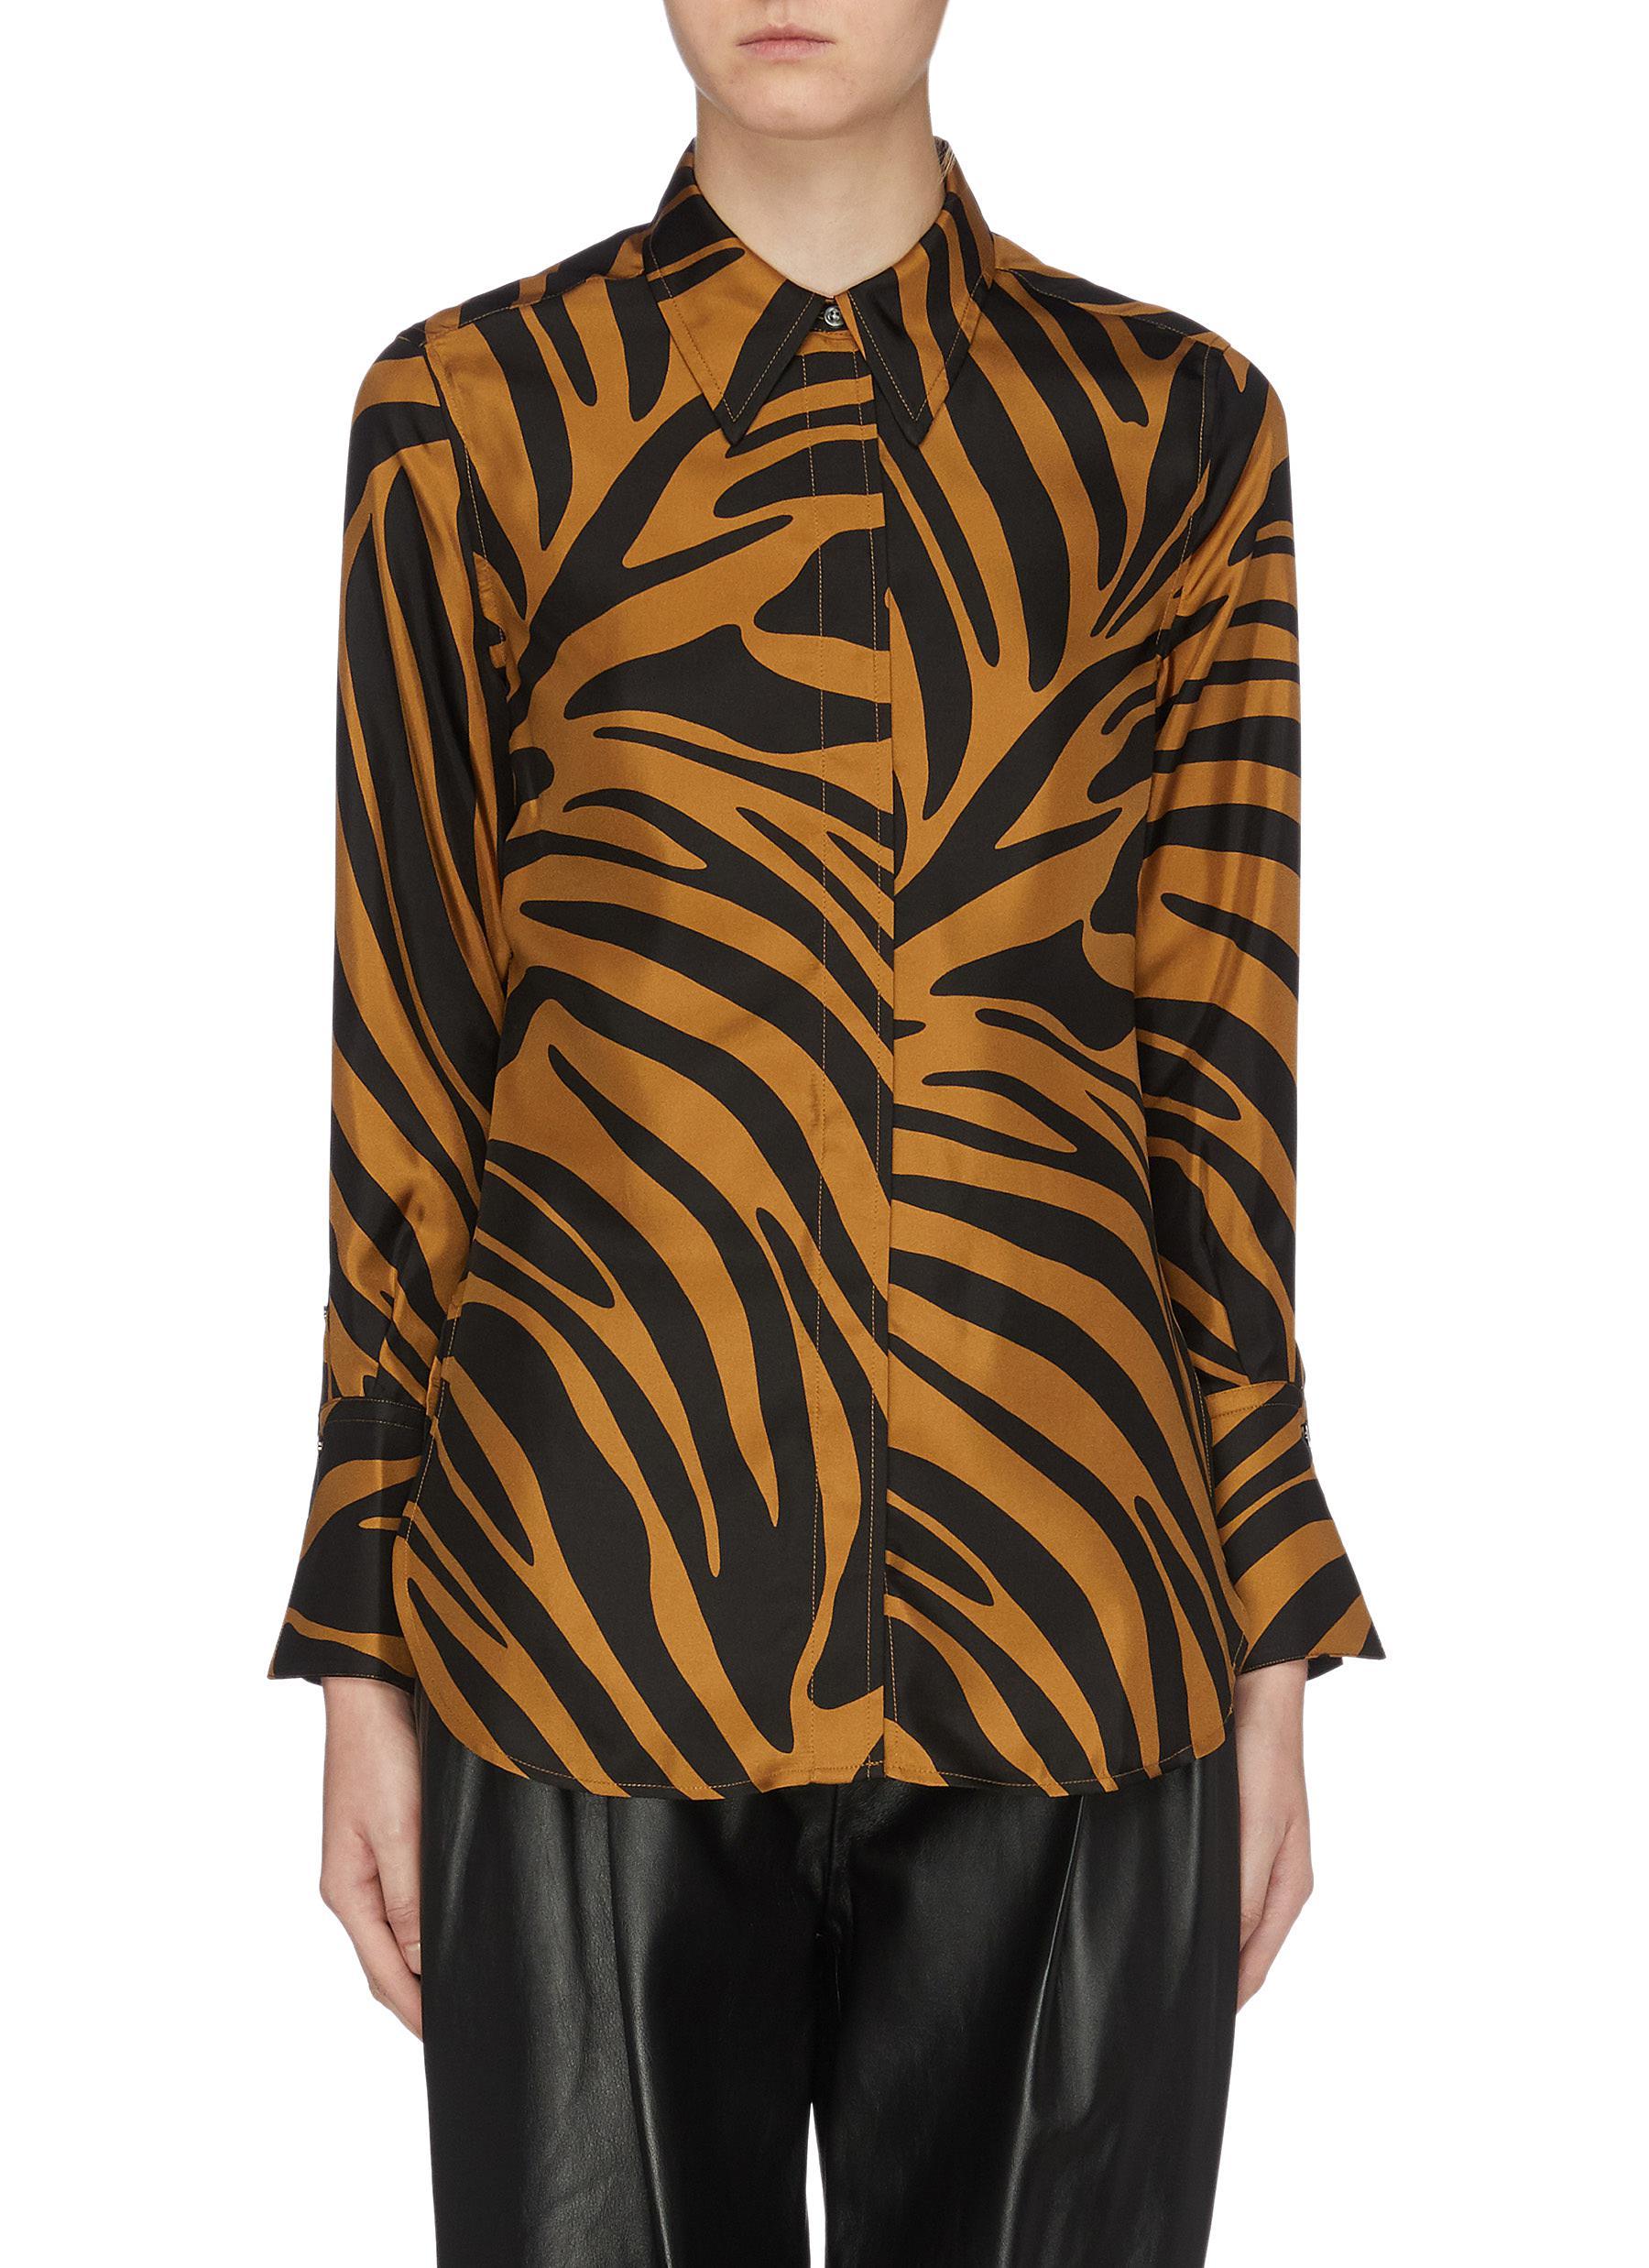 Zebra print silk satin blouse by 3.1 Phillip Lim